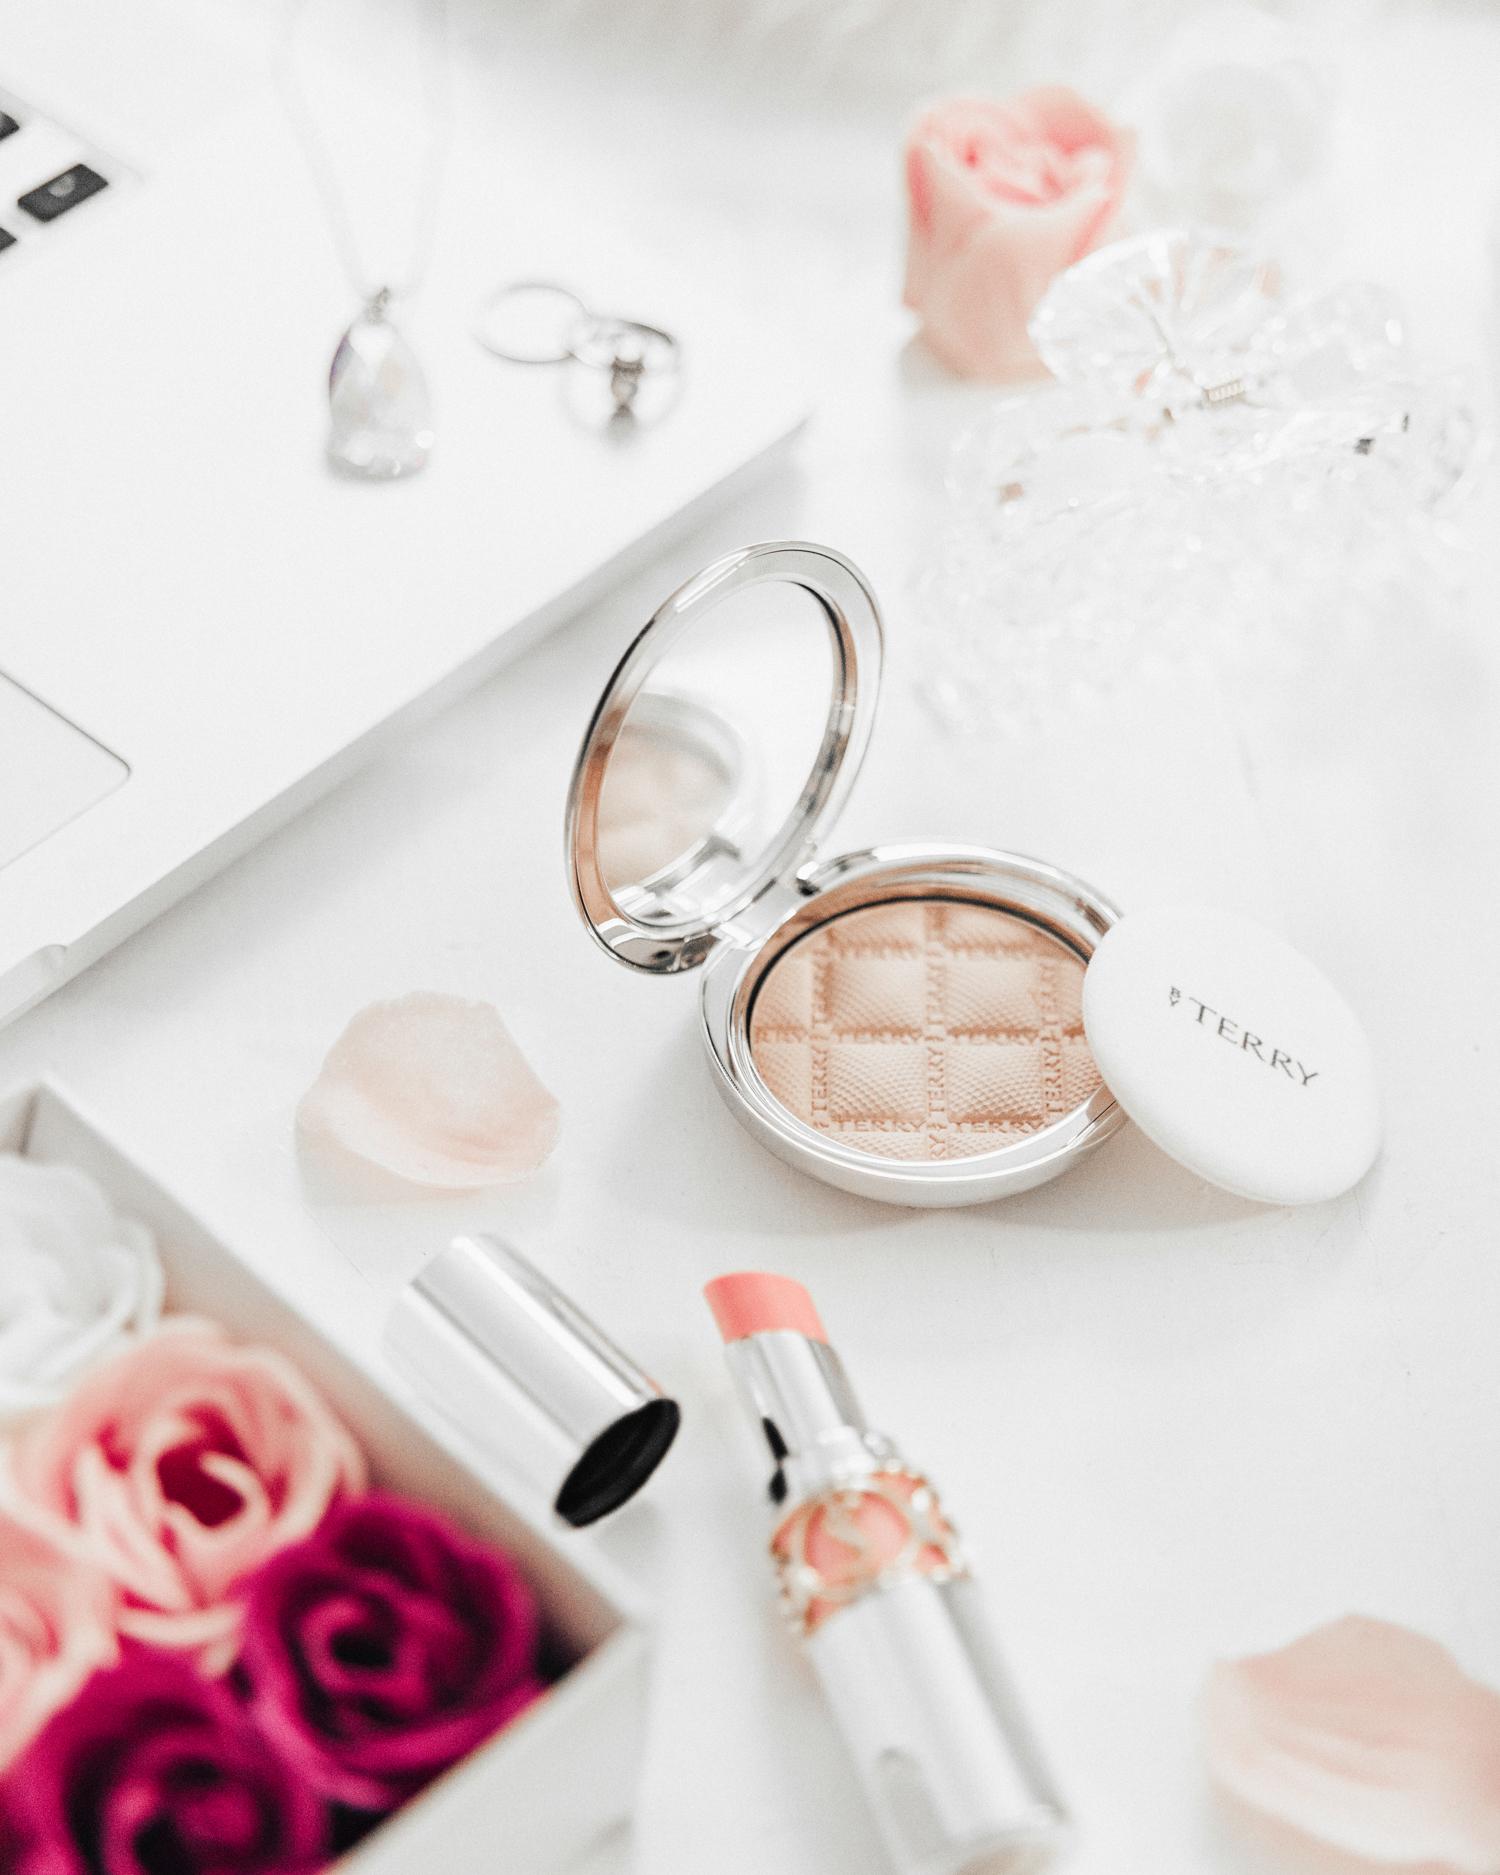 Flatlay: Elegant Beauty Products